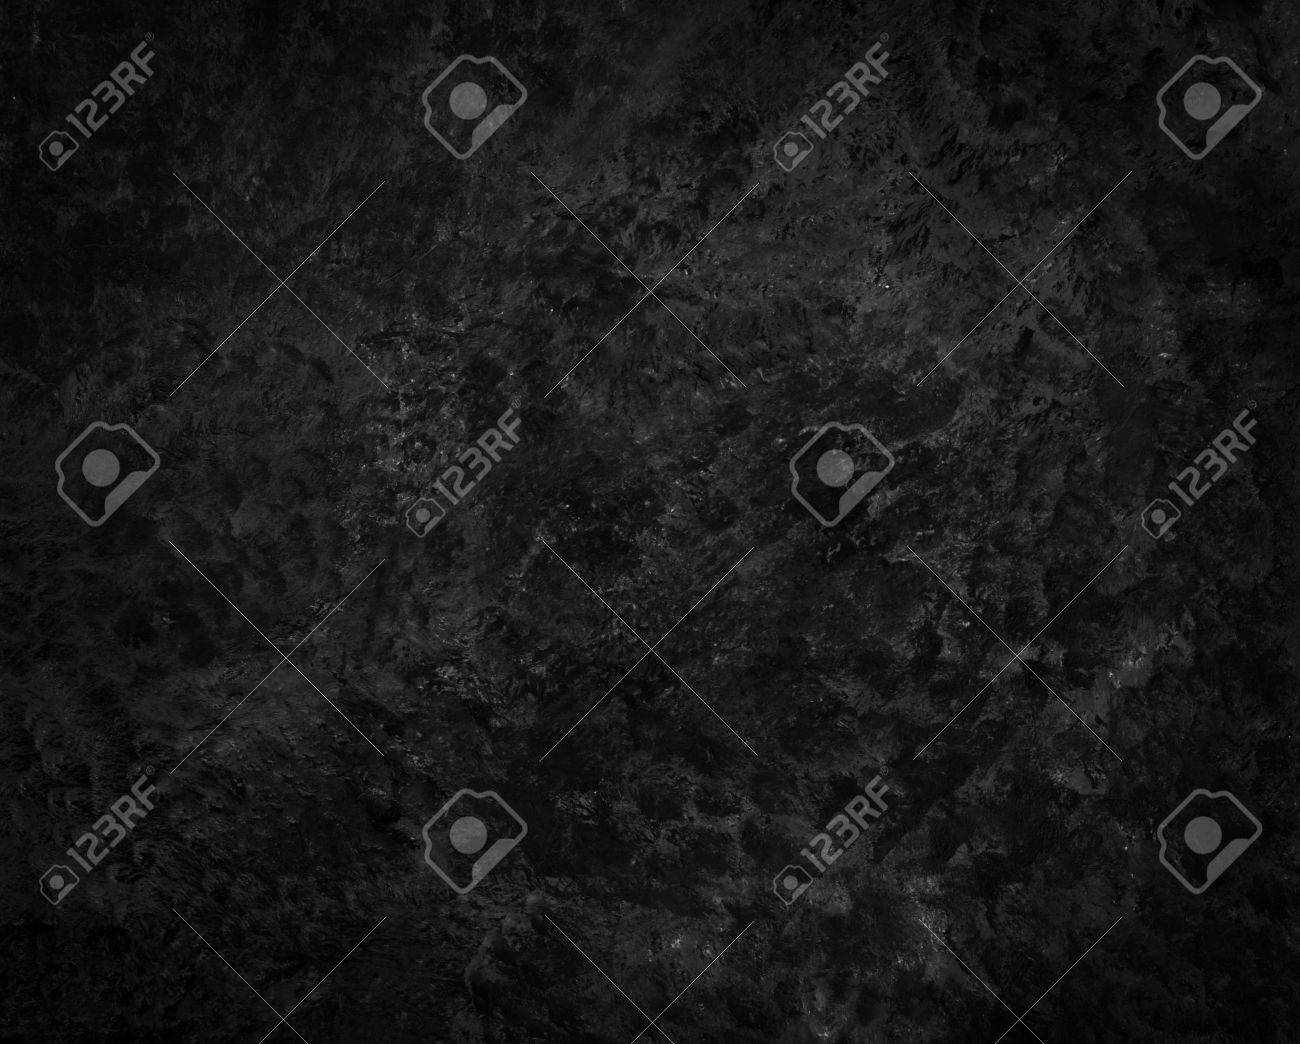 Dark stone texture backdrop background - 51528496